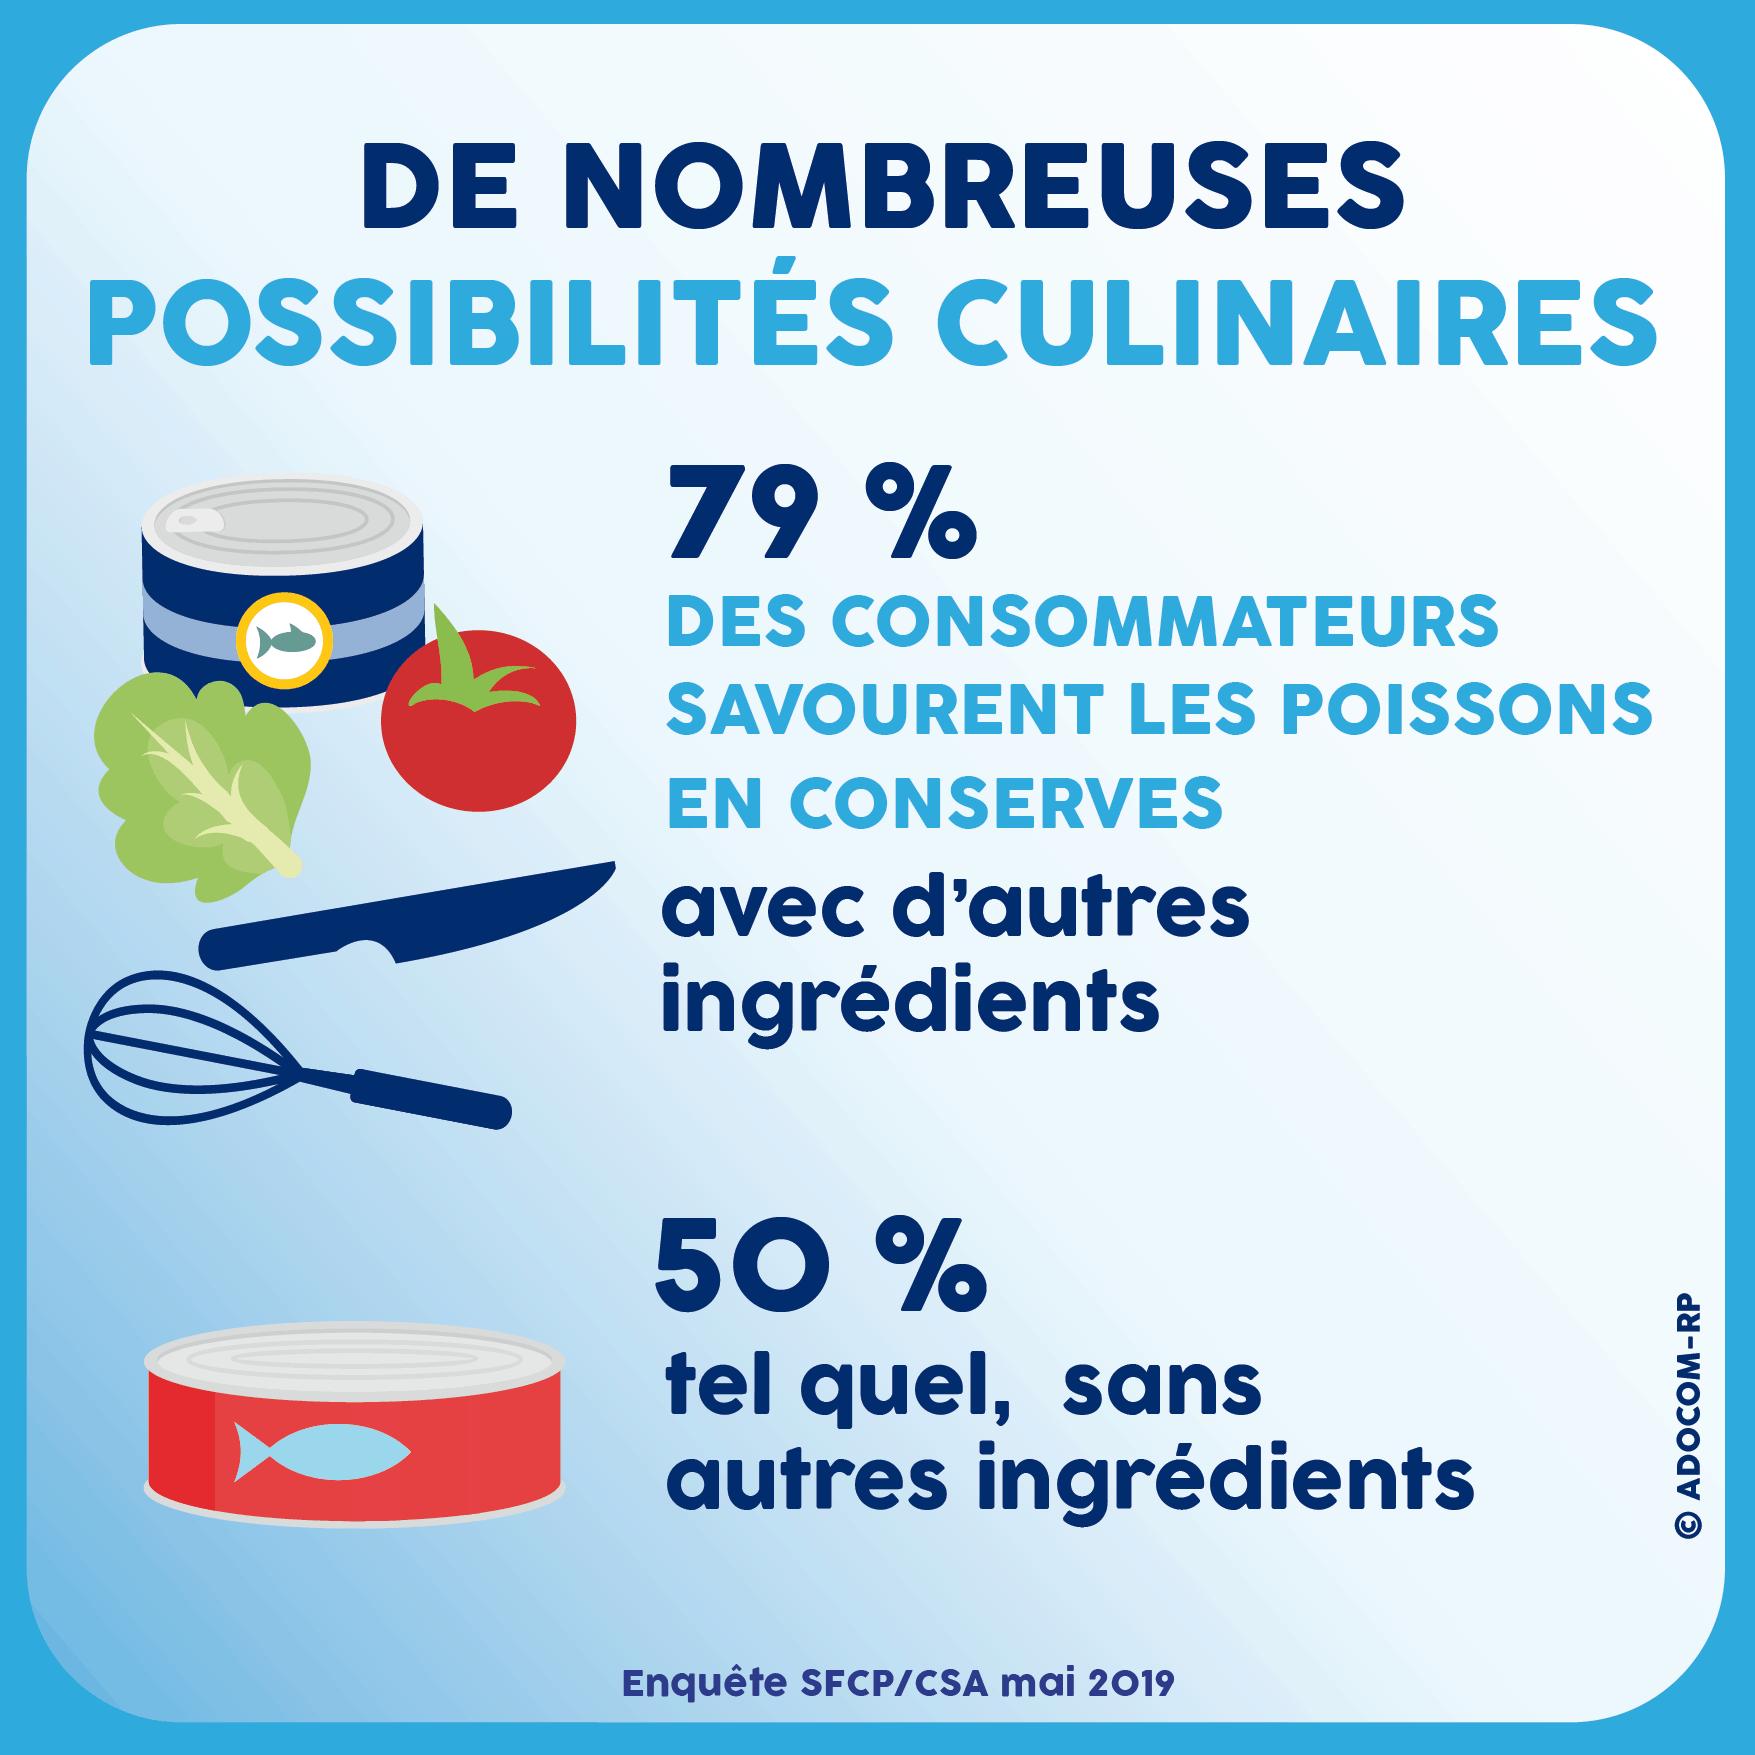 De nombreuses possibilités culinaires - Enquête SFCP/CSA mai 2019 - Adocom-RP